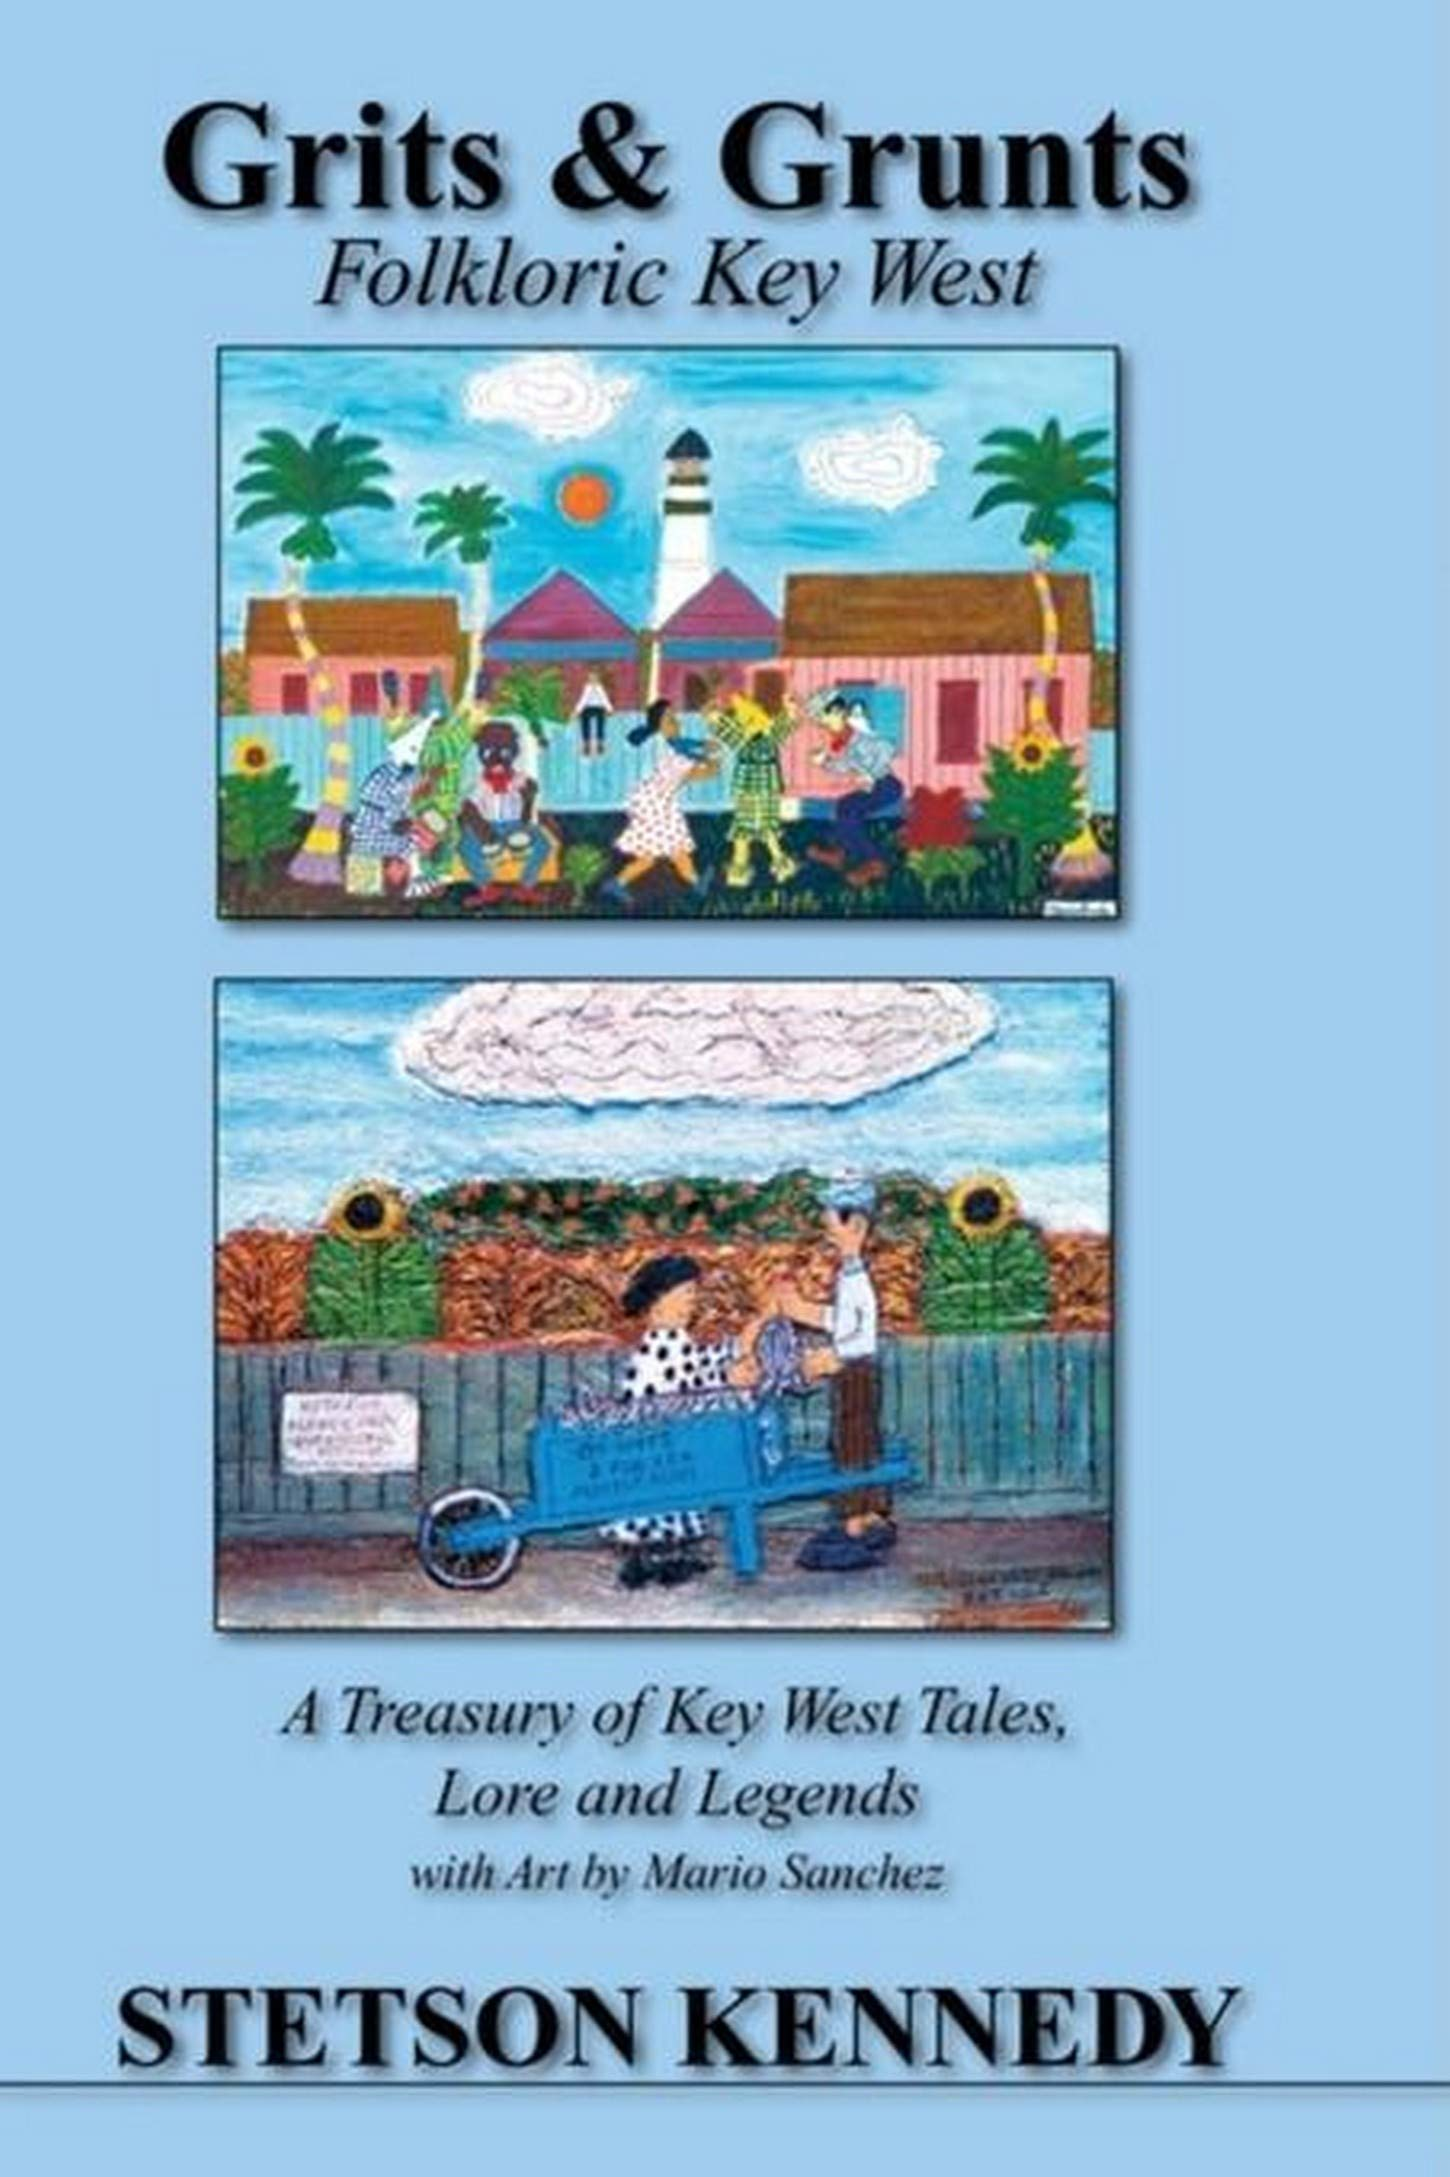 Grits & Grunts: Folkloric Key West por Stetson Kennedy